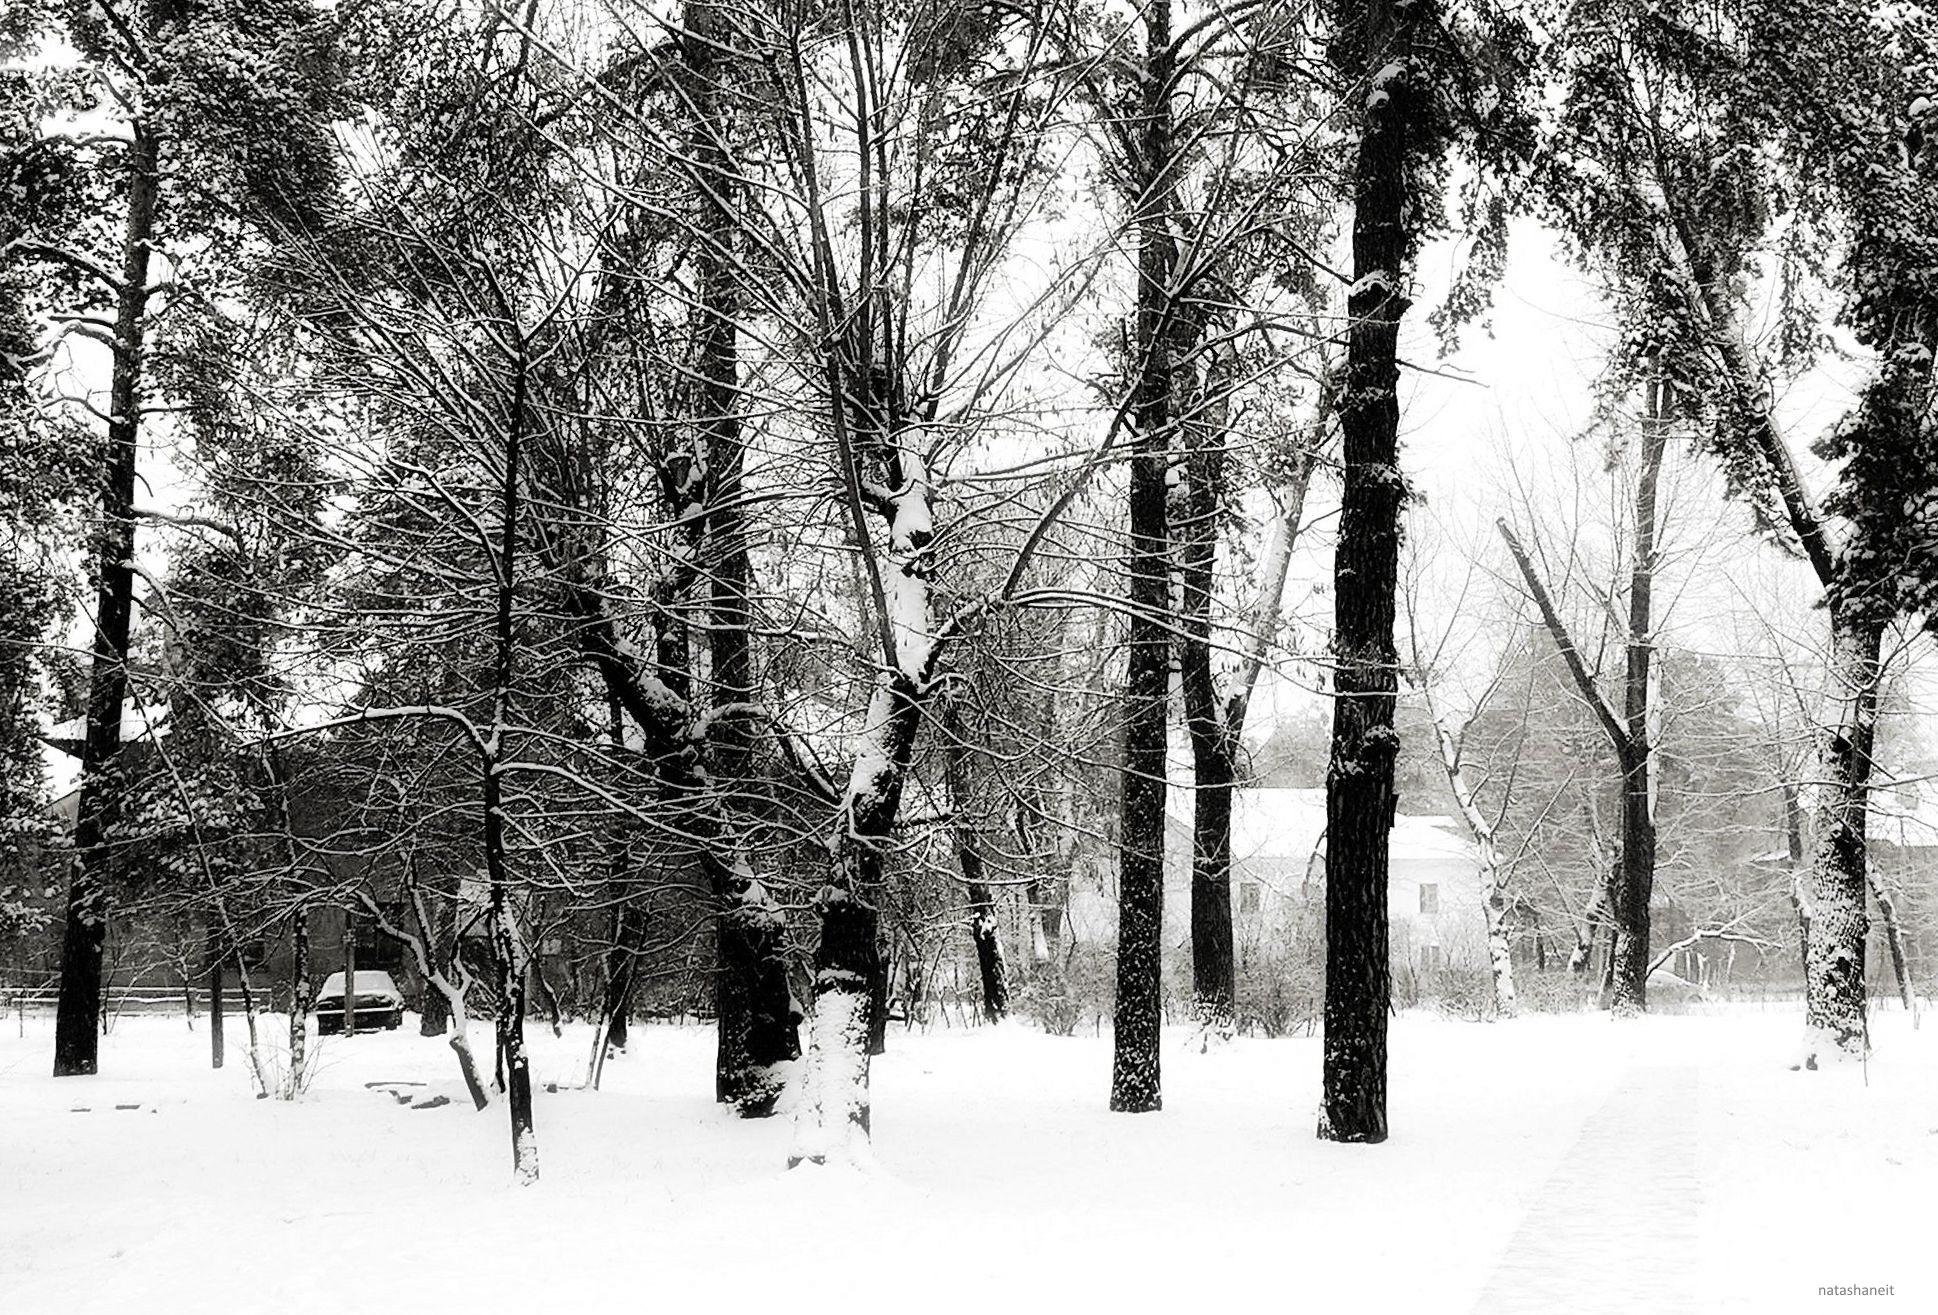 Snowy january by natashaneit